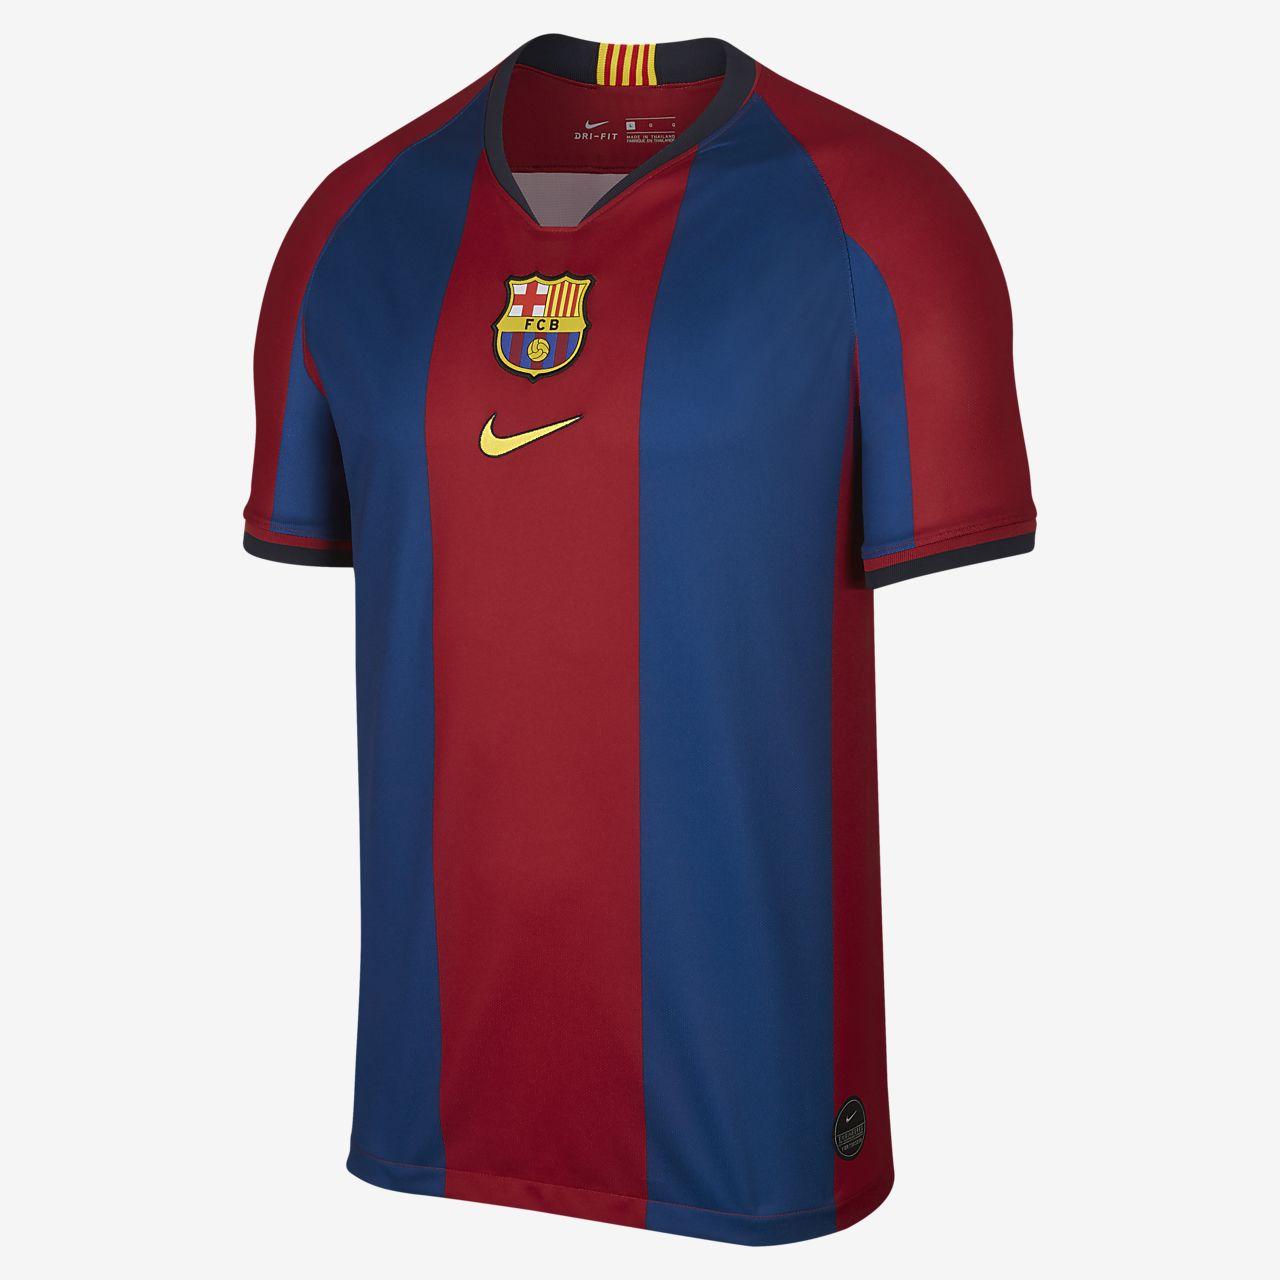 Maillot FC Barcelona Stadium '98/99 pour Homme